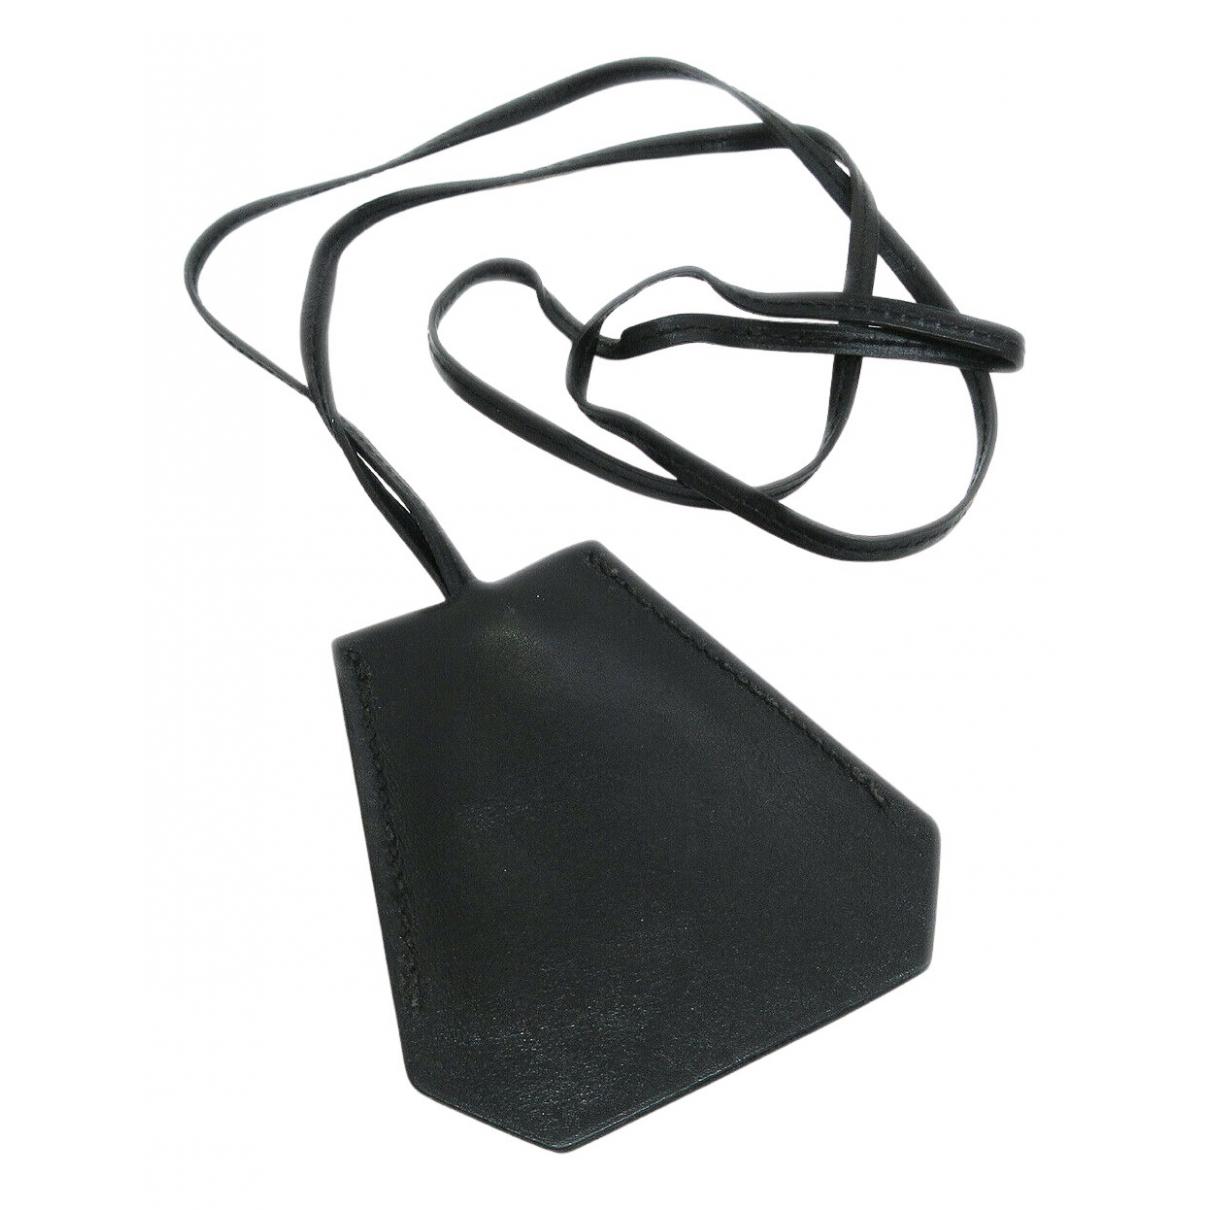 Hermes \N Kette in  Schwarz Leder